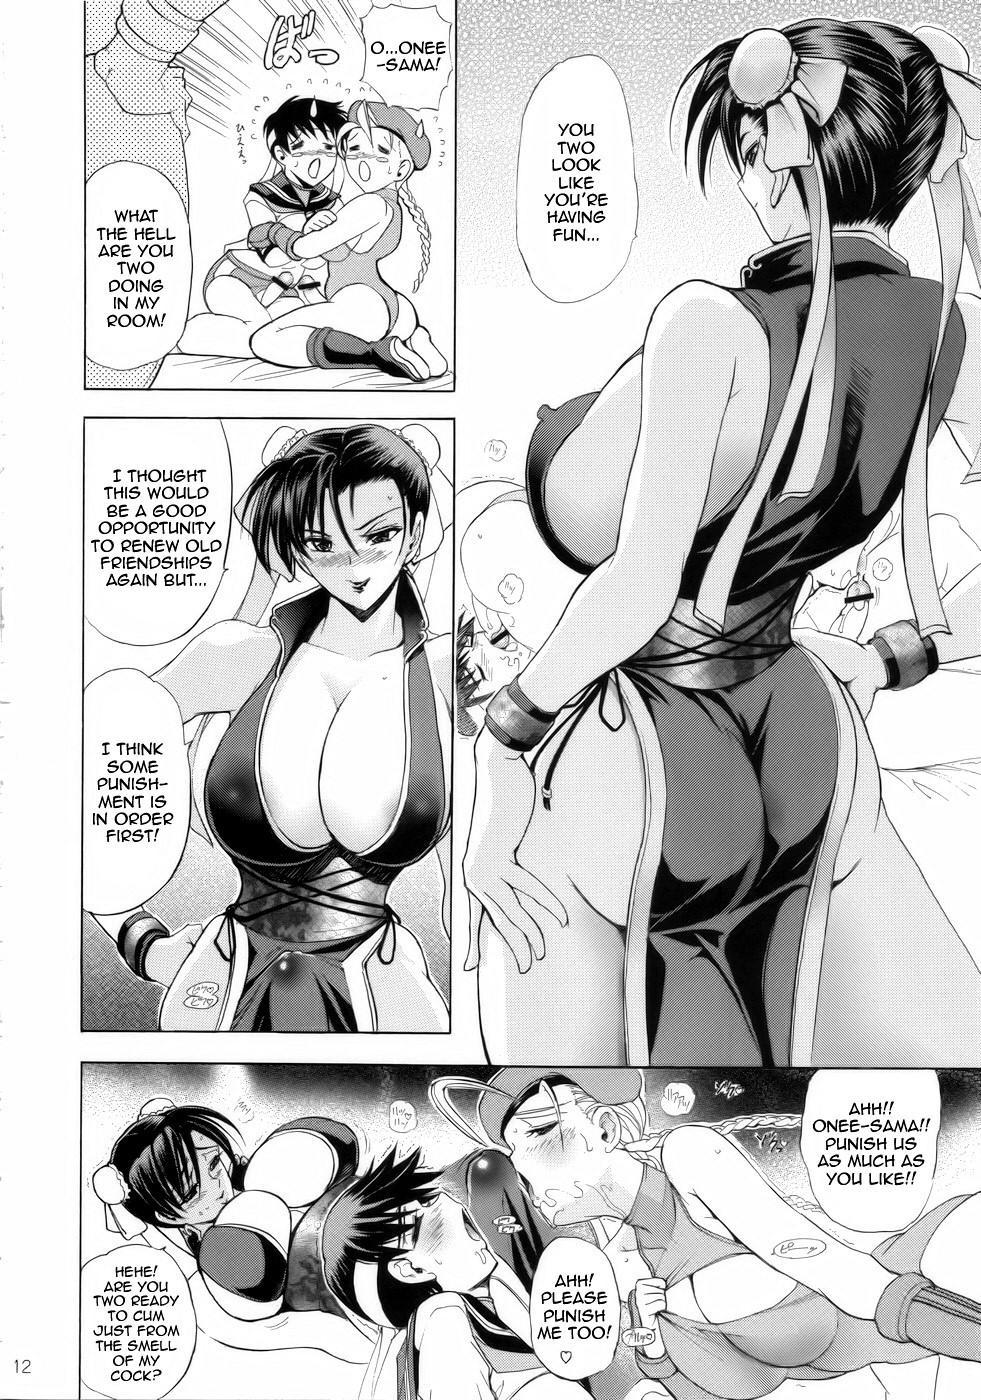 (C75) [Kawaraya Honpo (Kawaraya A-ta)] Hana - Maki no Juunana - Housenka (Street Fighter) [English] [Yuribou] 10